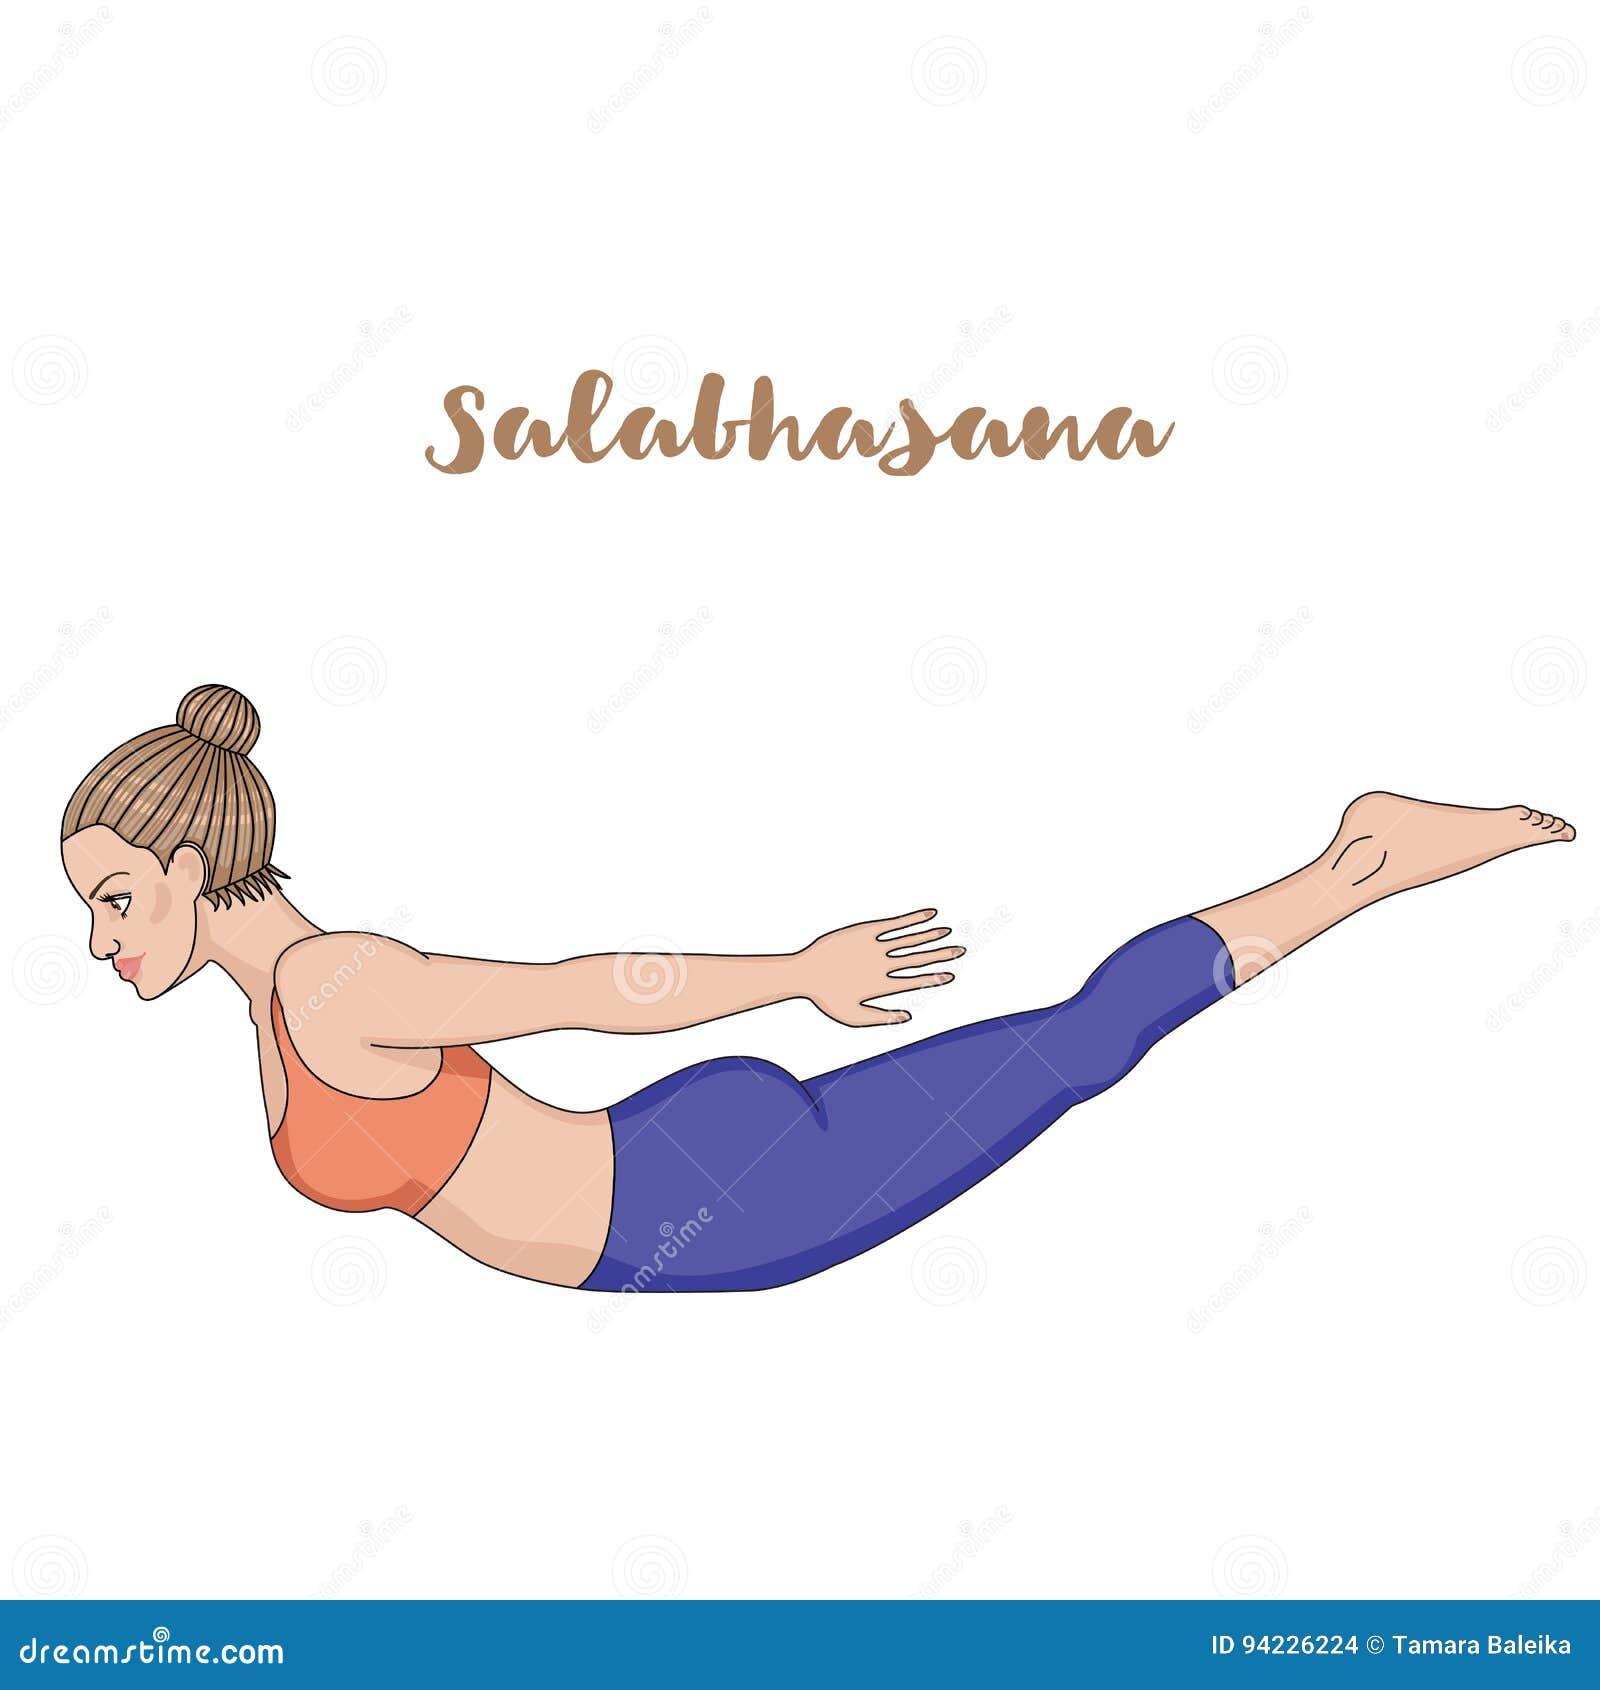 Images Of Salabhasana